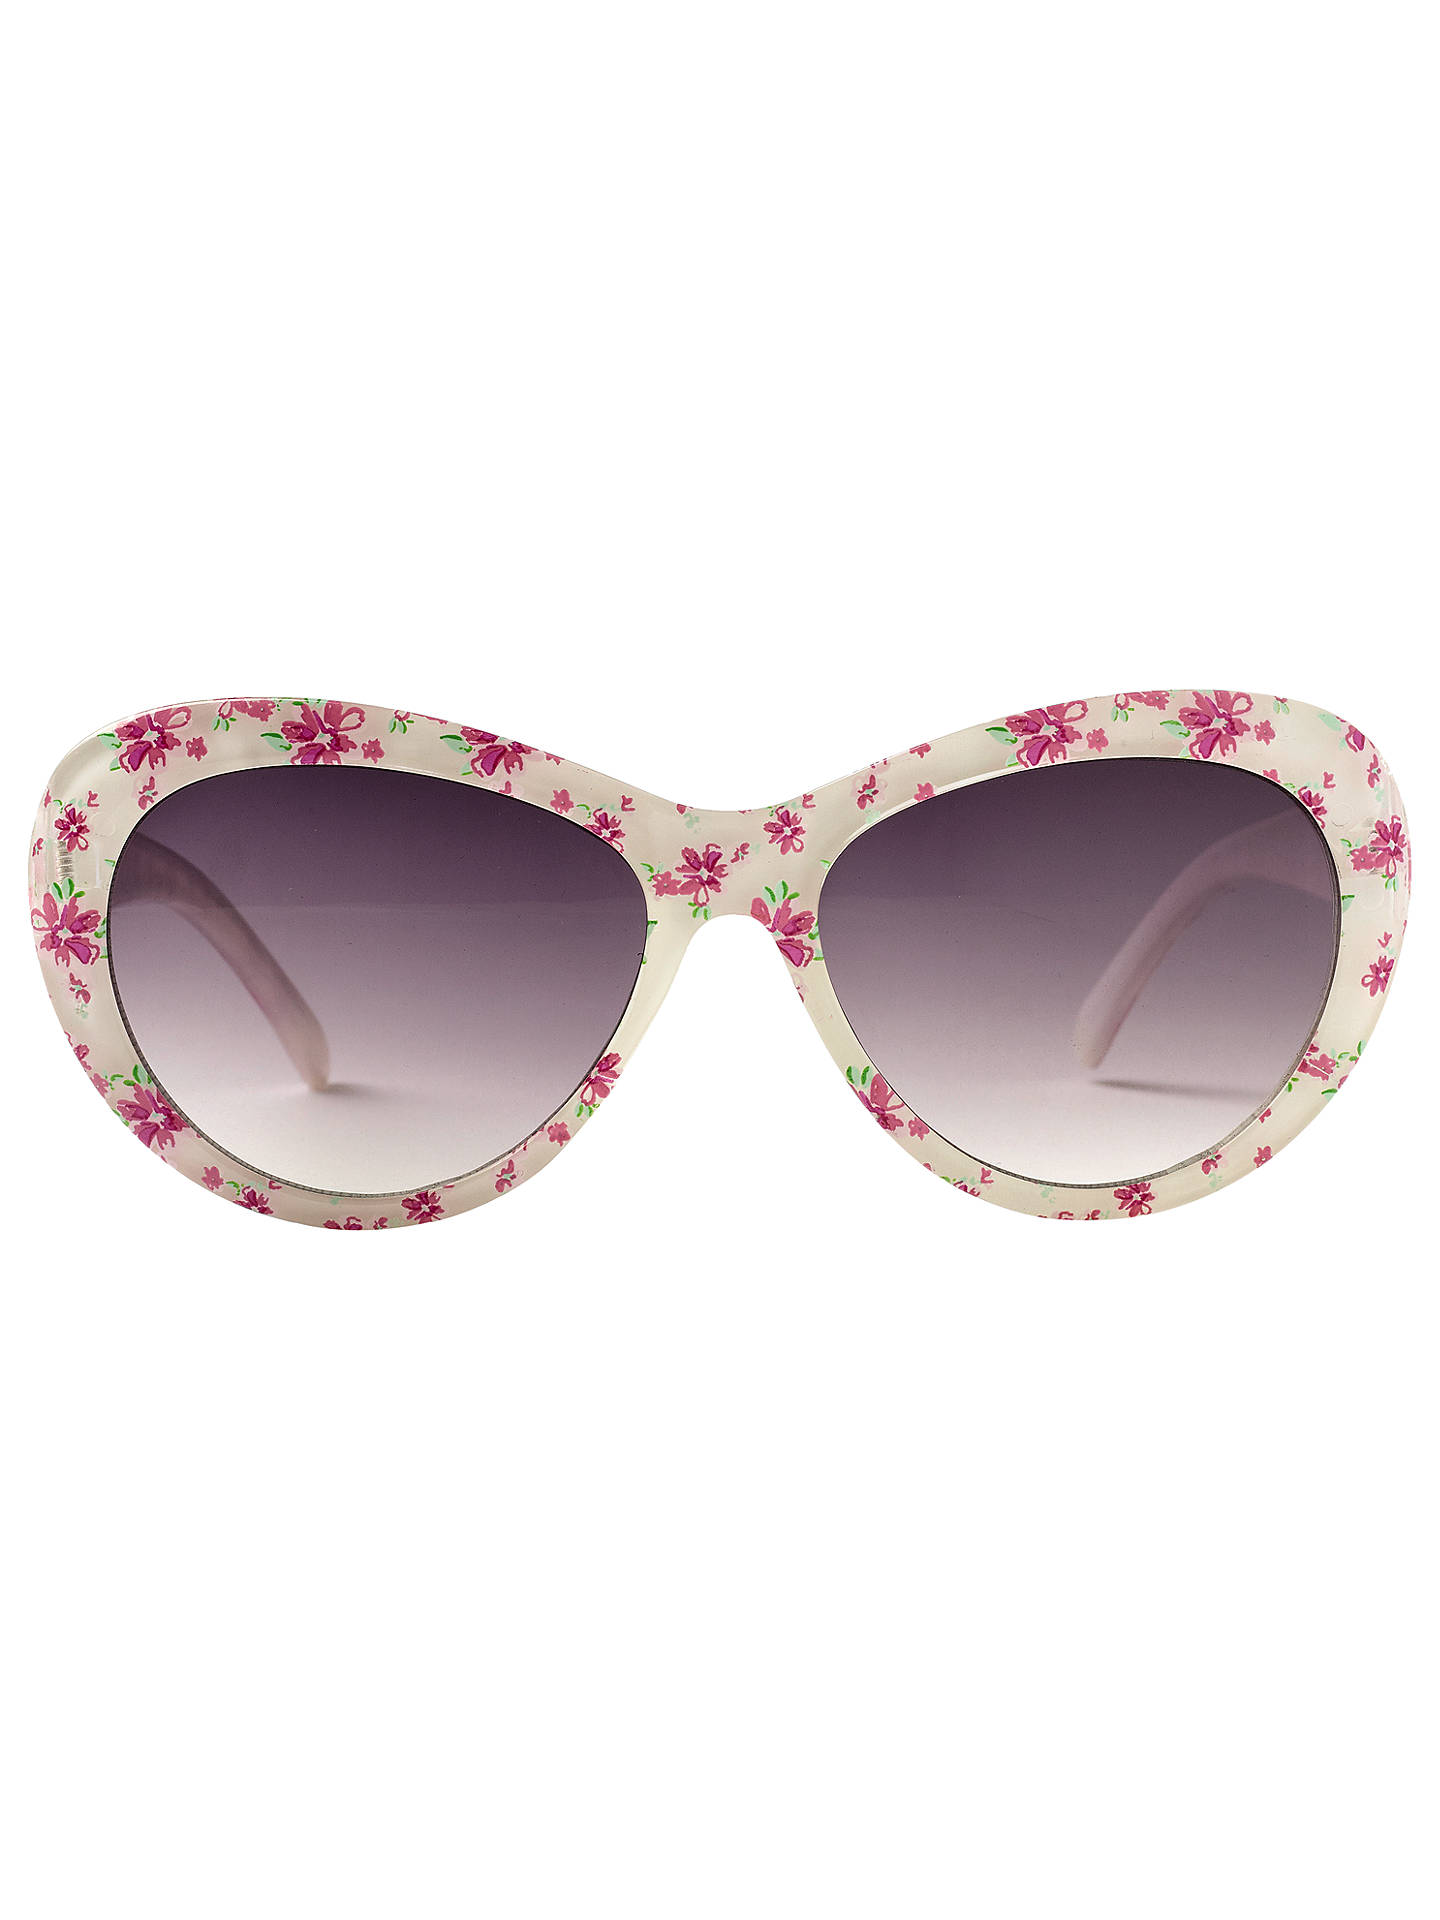 a8ffb7248a Buy Fat Face Children s Floral Print Sunglasses